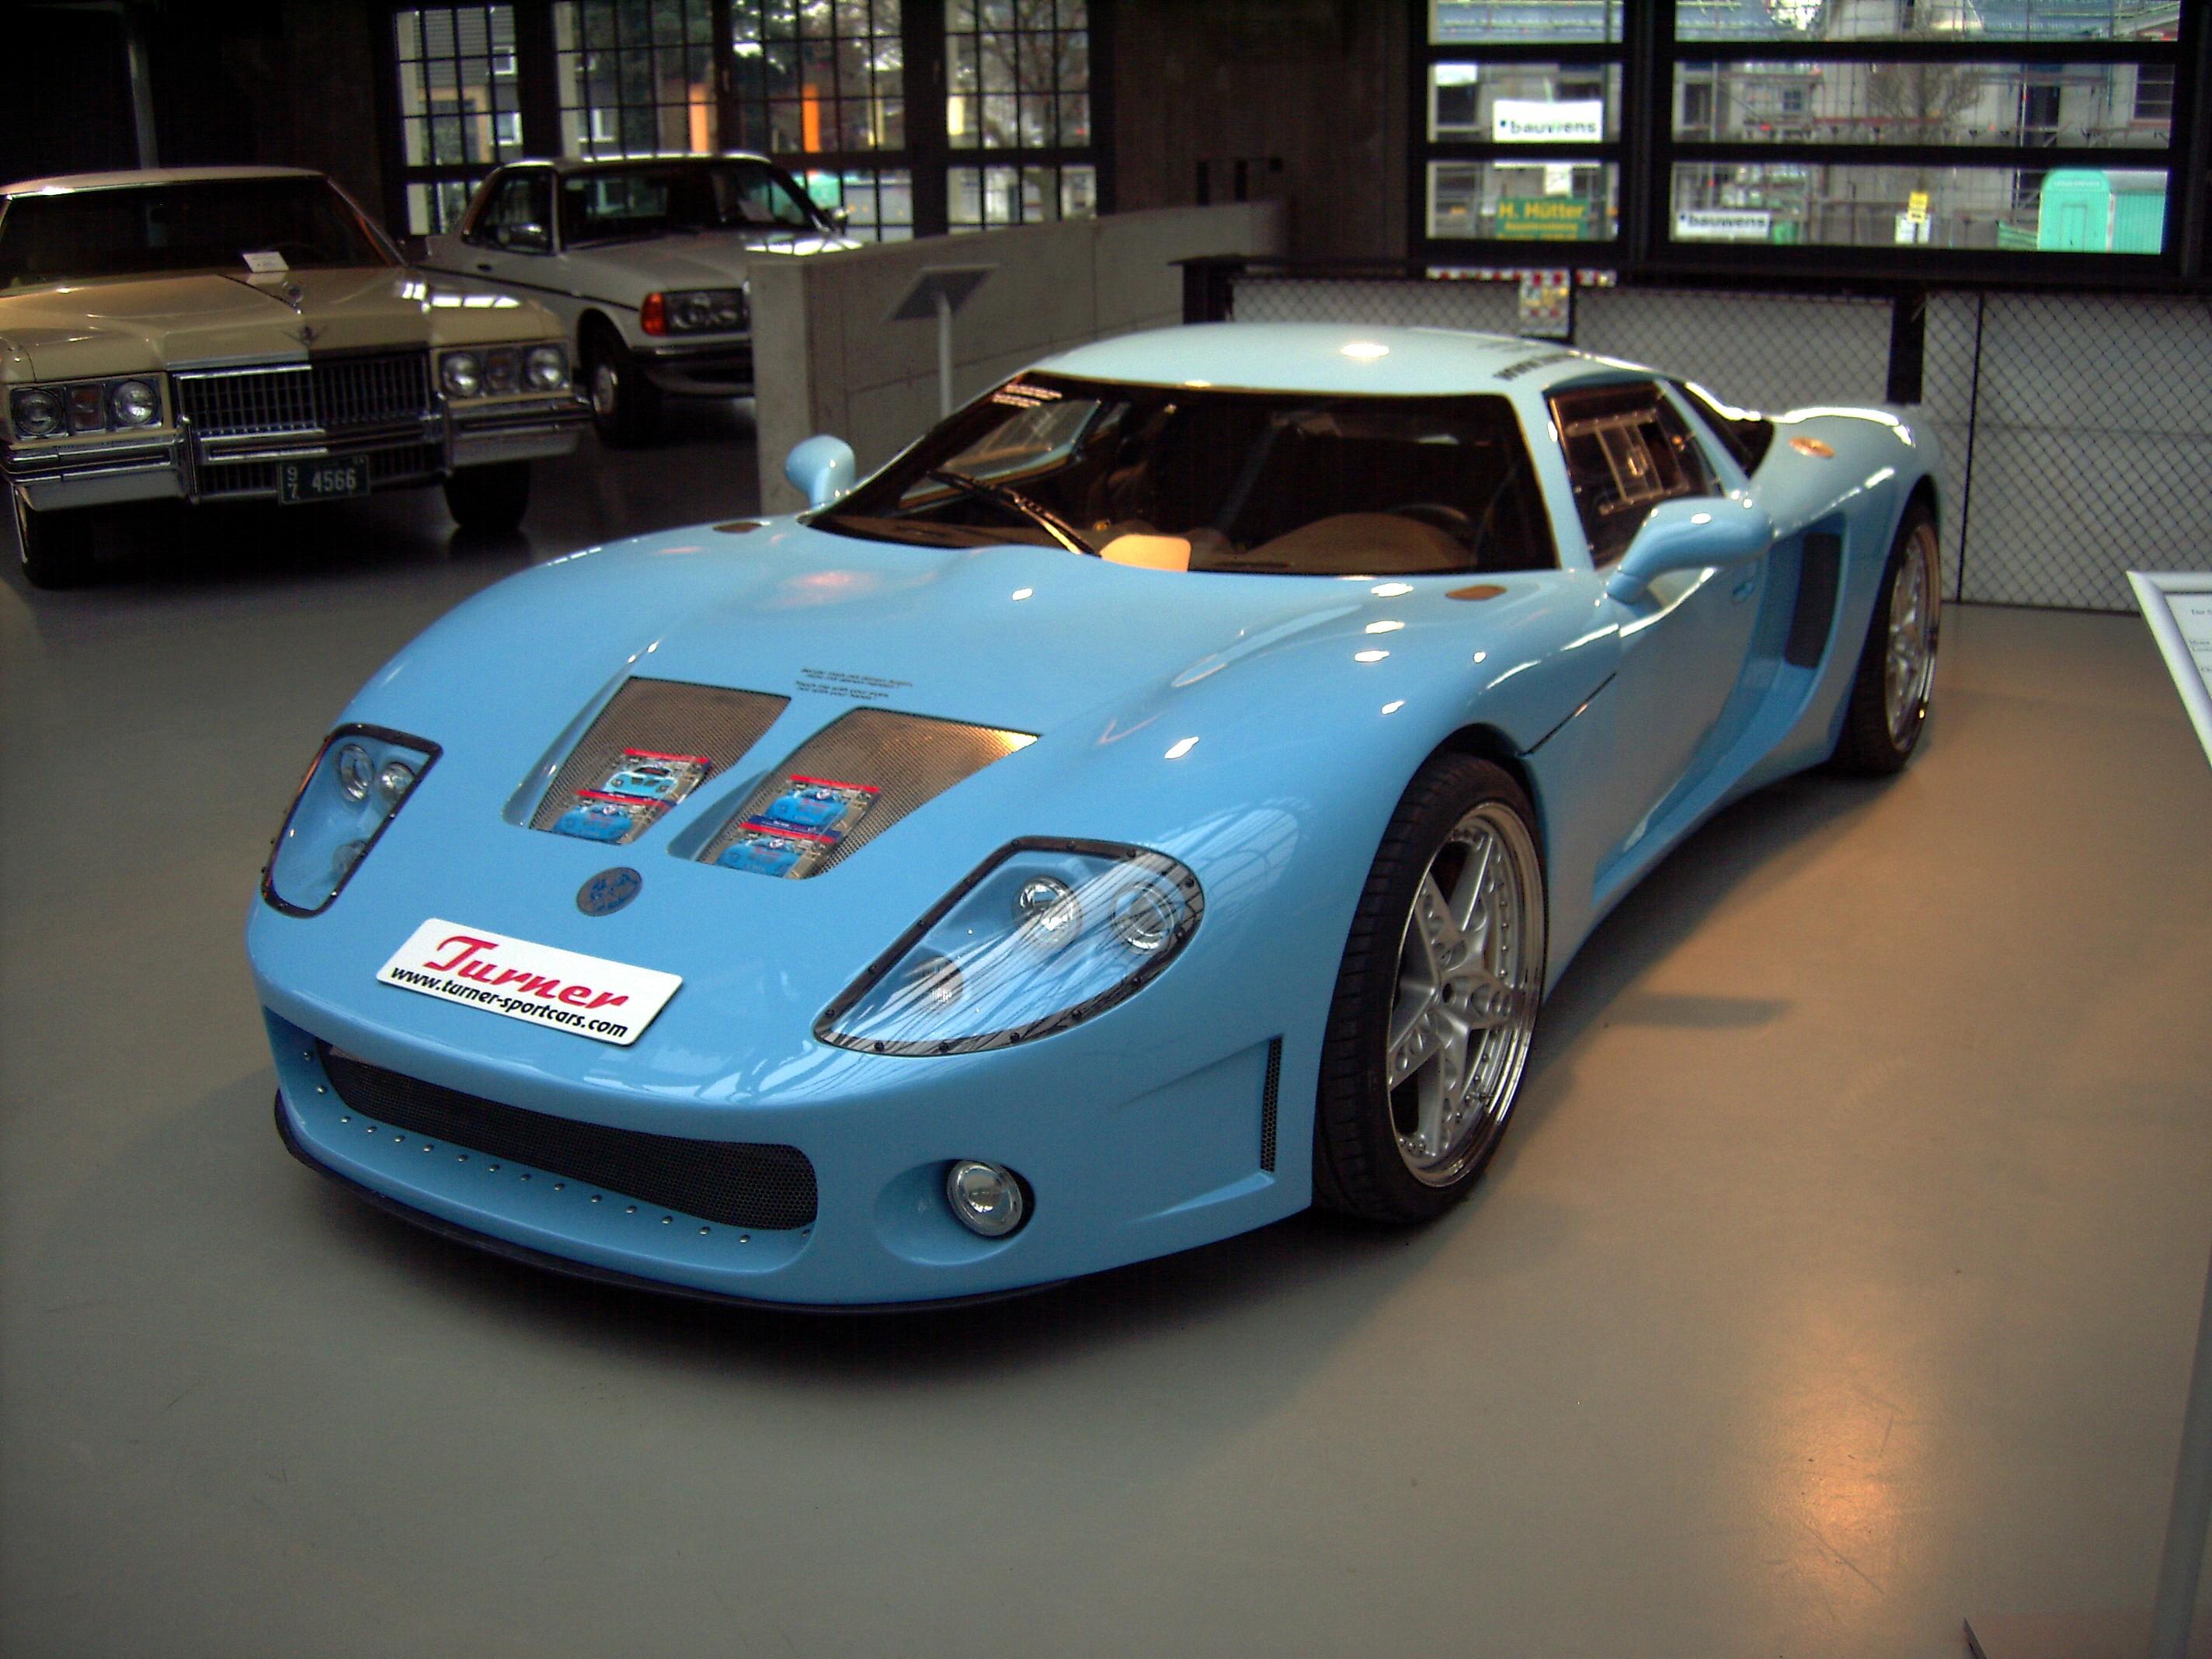 49 Turner GTO · gnmpf74